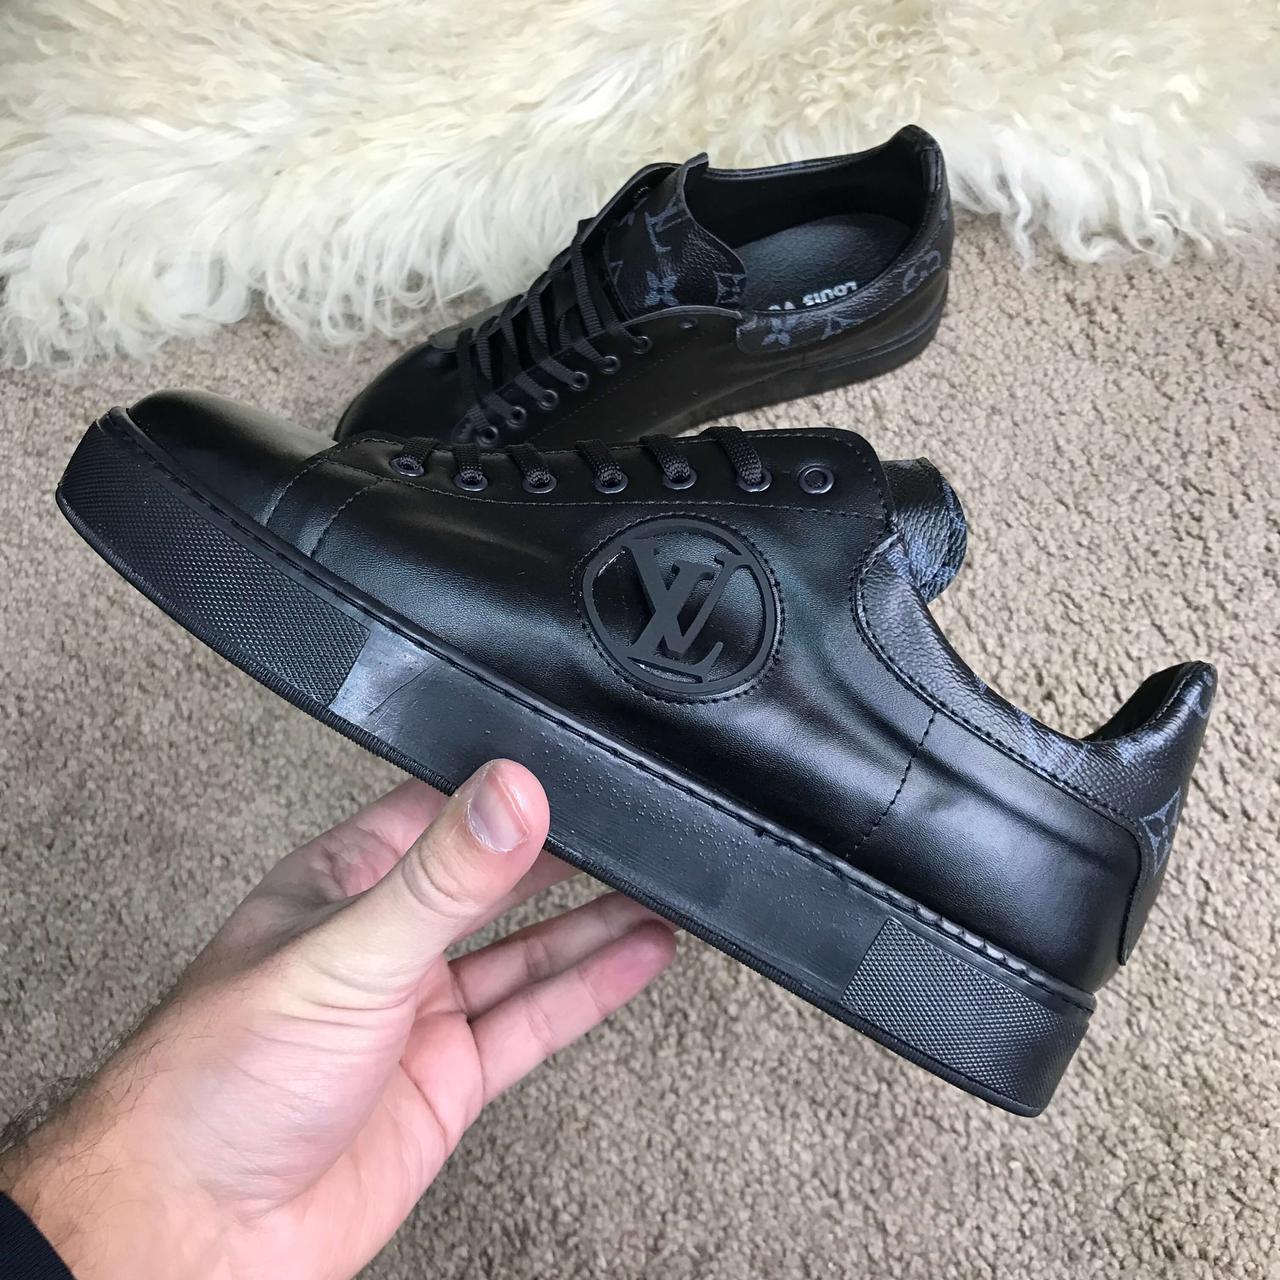 72095248cebec Мужские кроссовки Louis Vuitton Rivoli Black (Топ реплика ААА+) - Siwer -  Интернет